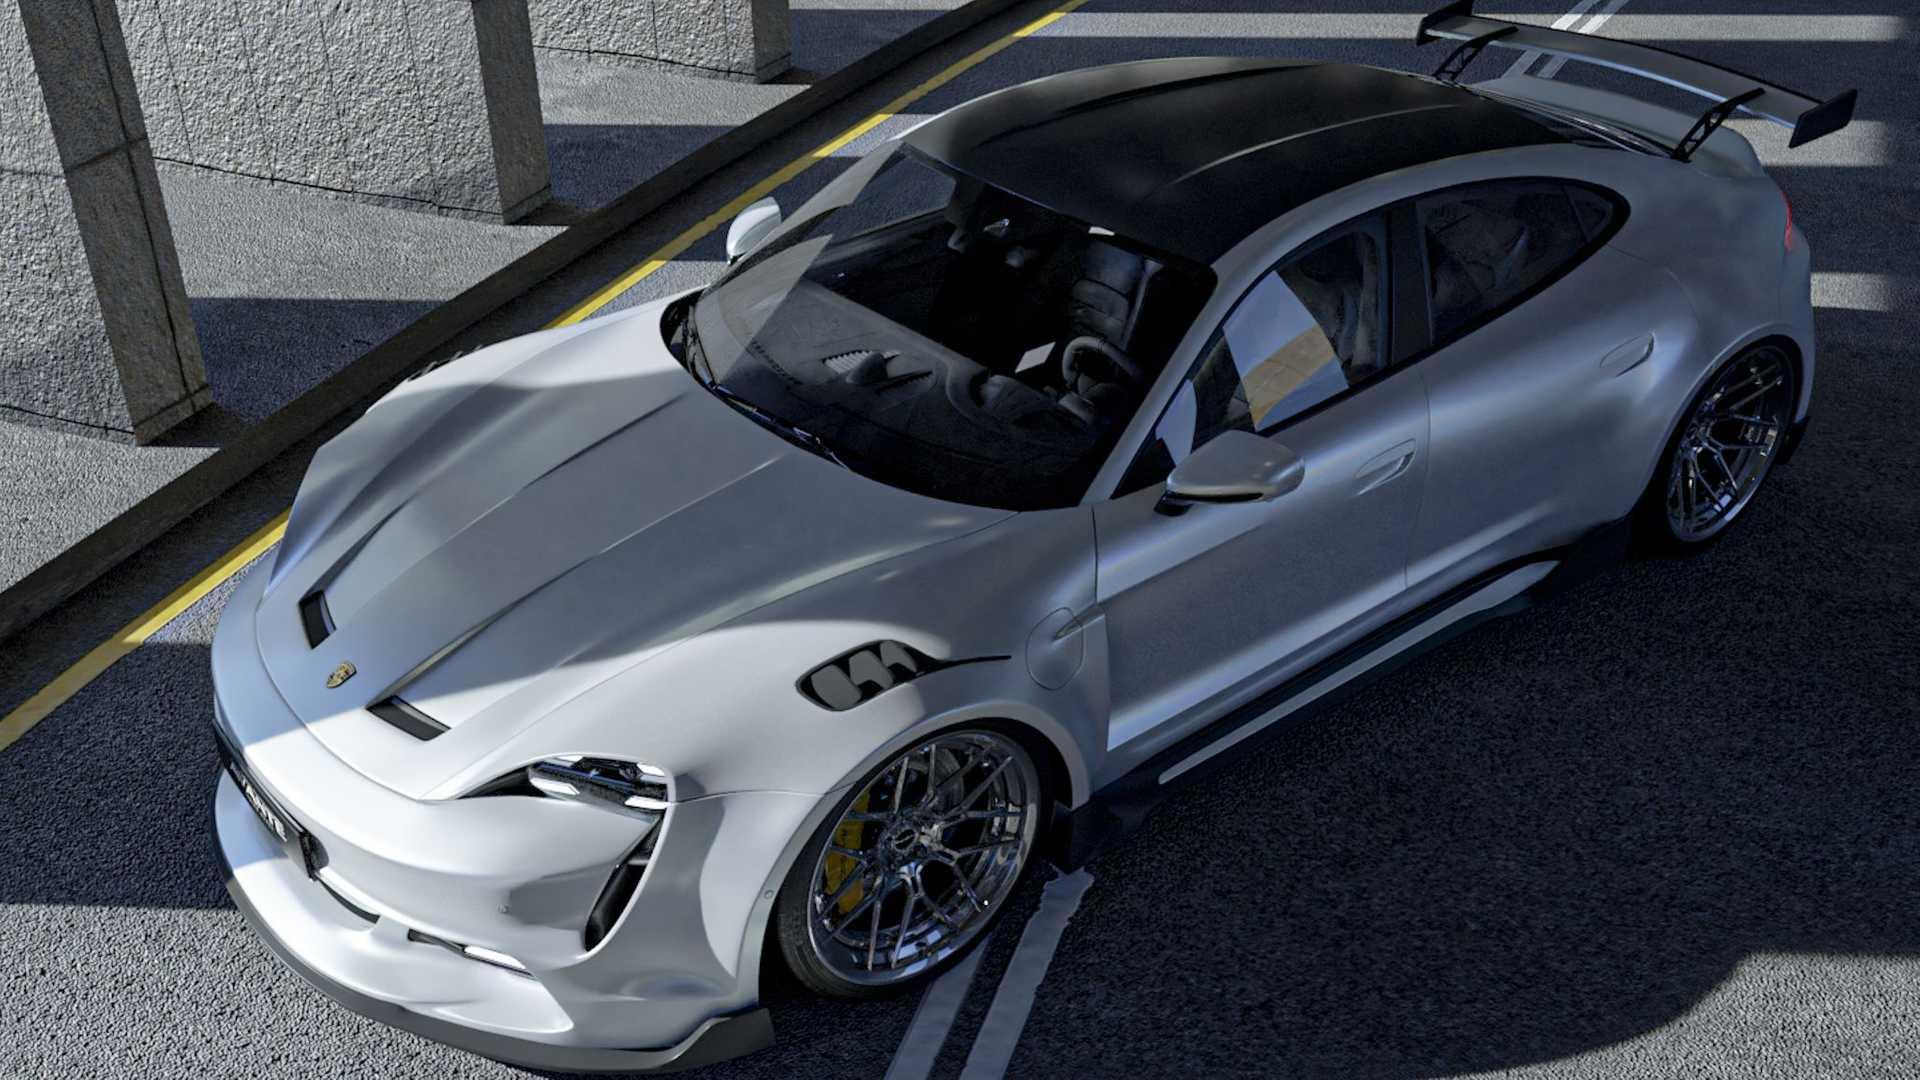 Porsche-Taycan-by-Avante-Design-2